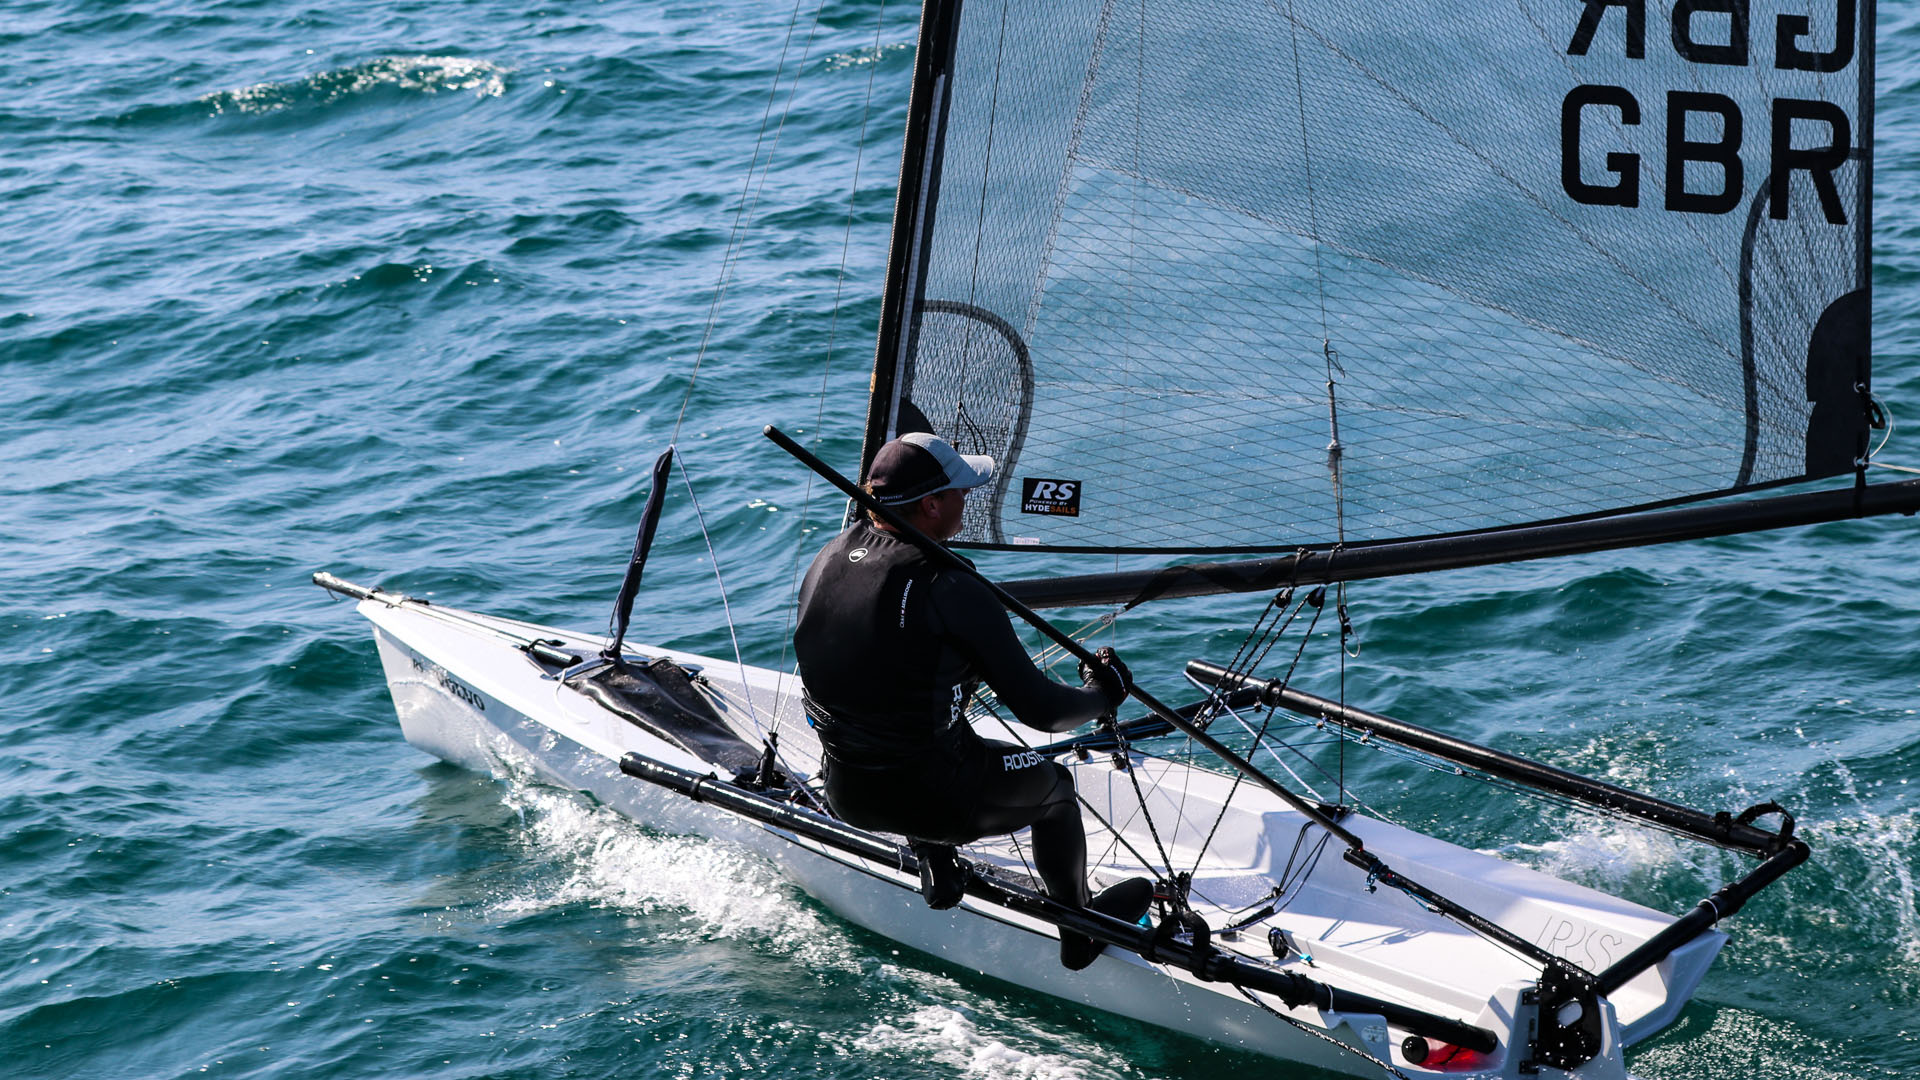 RS700 Inland Championship 2020